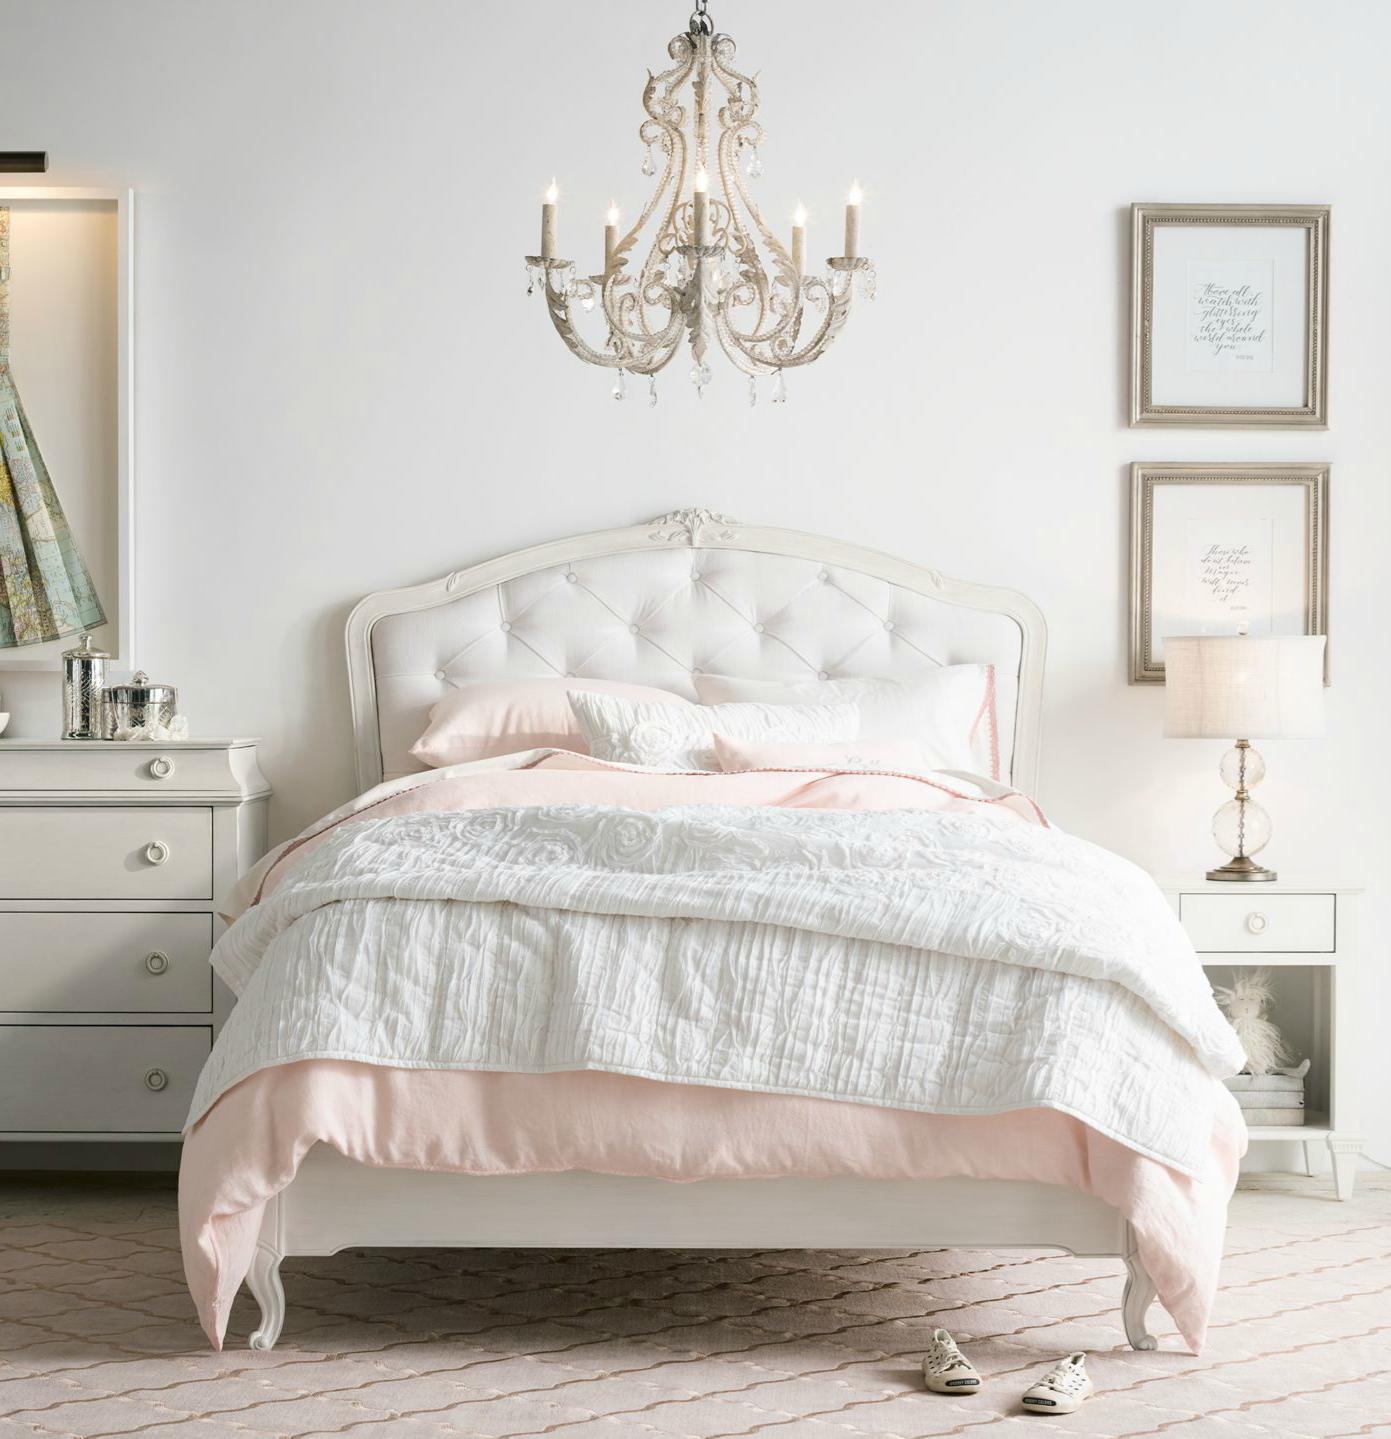 Louis XV-inspired Upholstered Bed. Sweet Sophistication